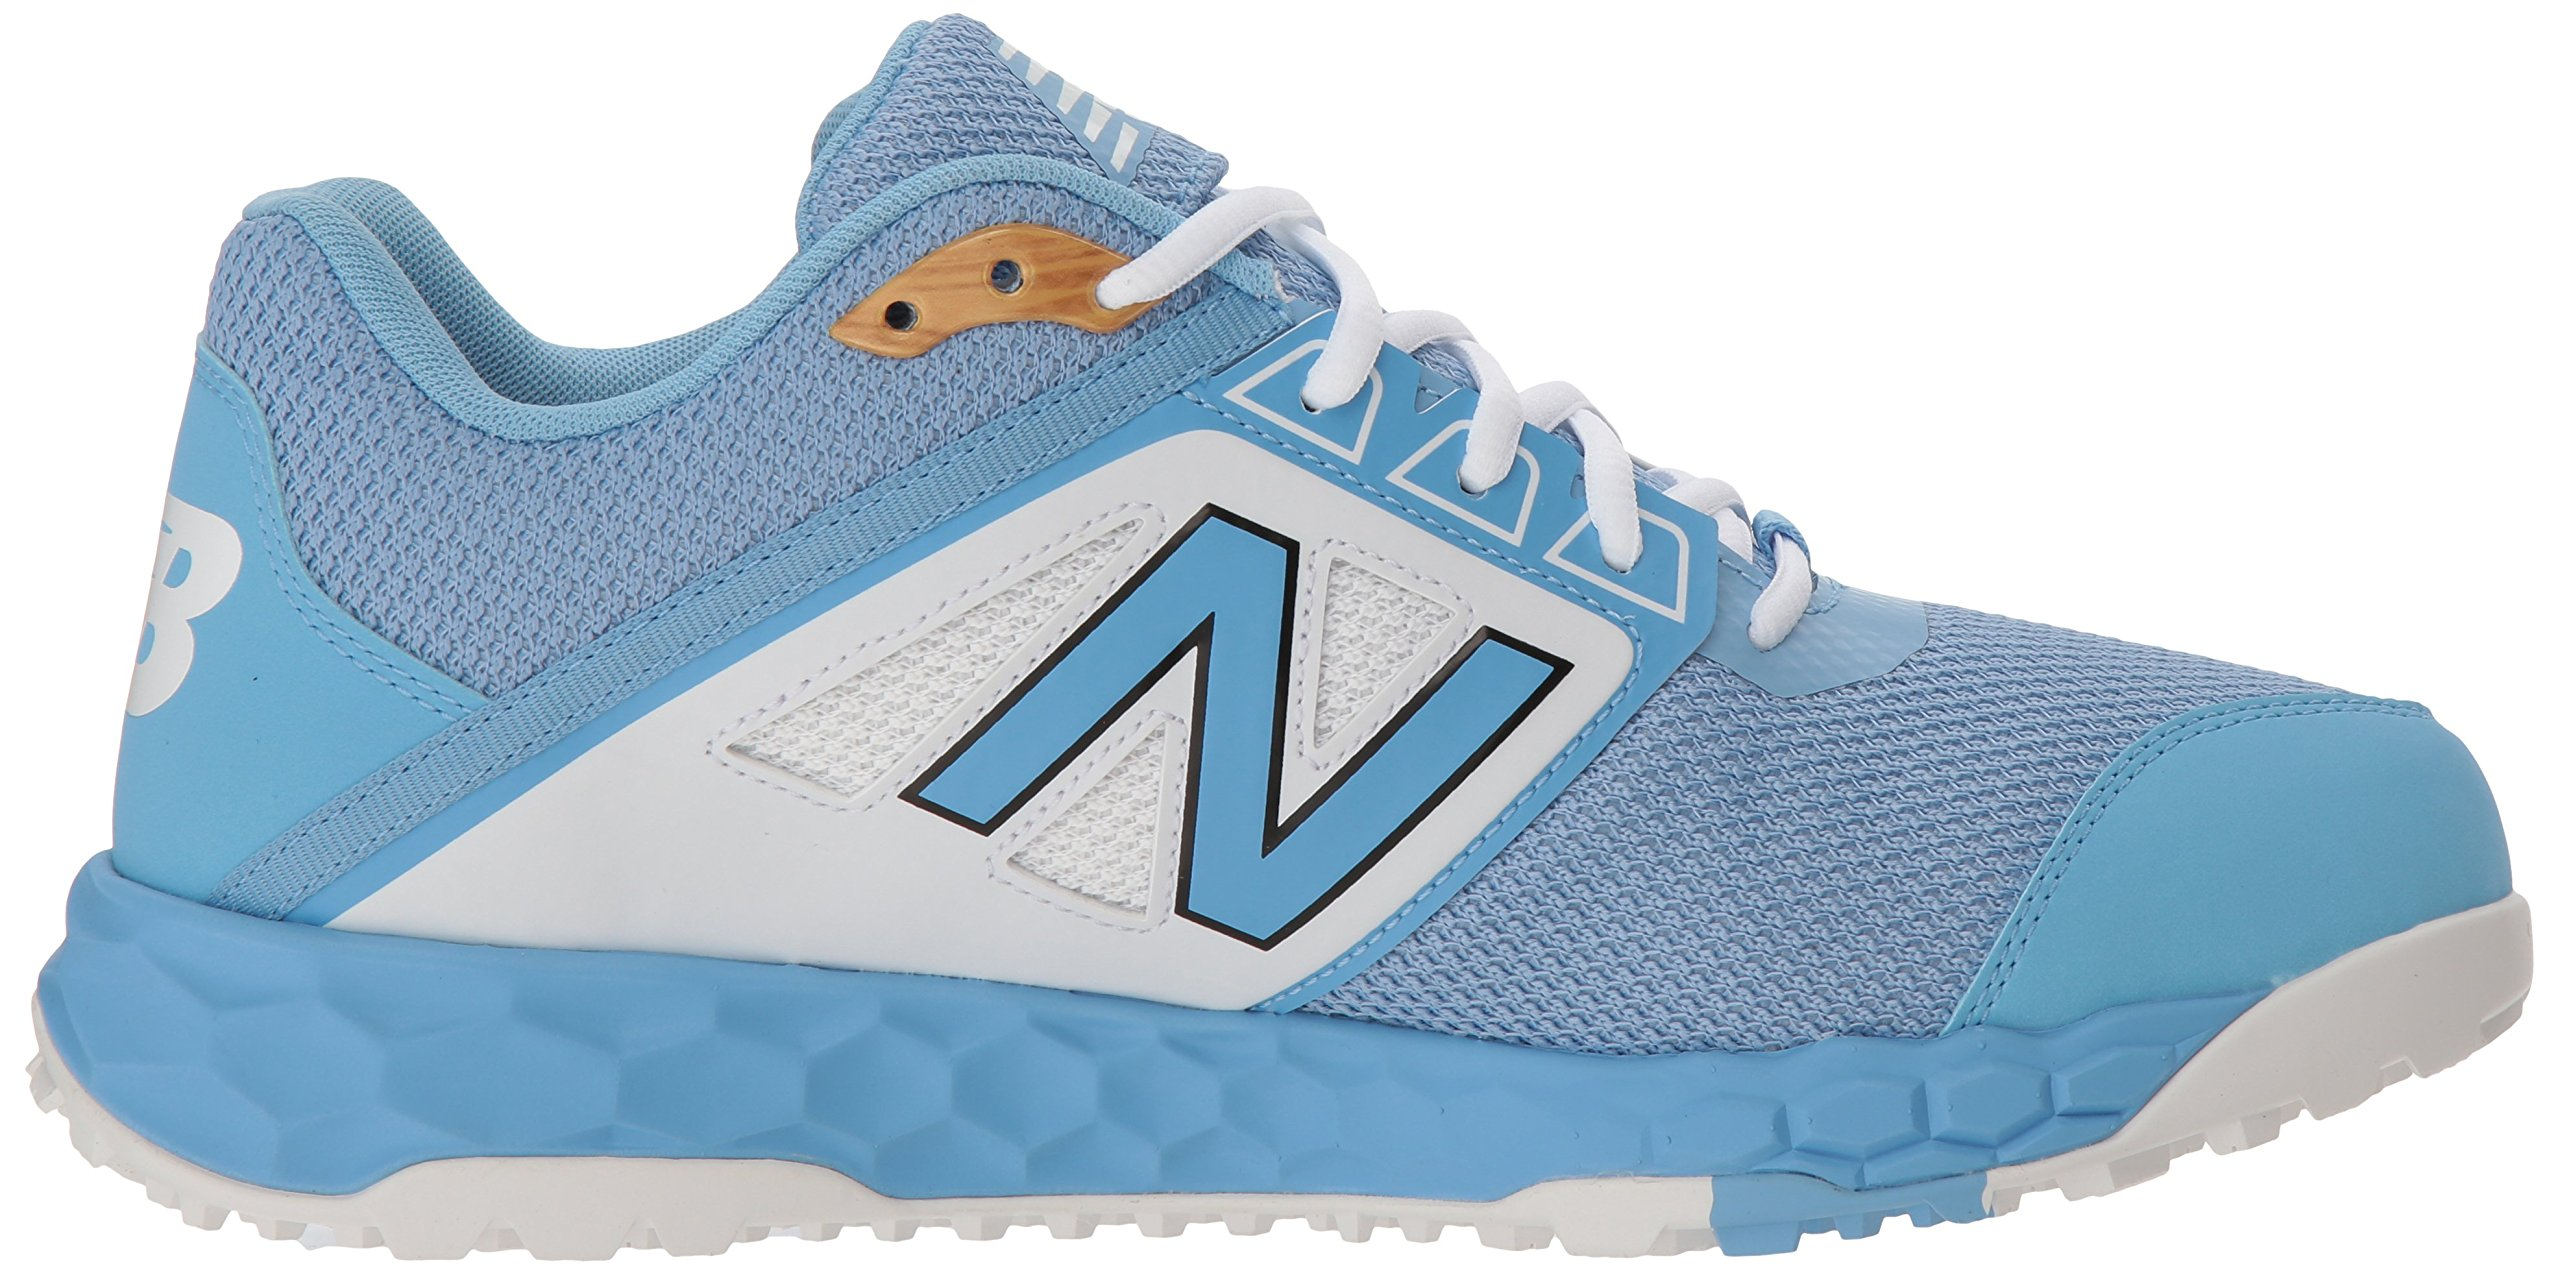 New Balance Men's 3000v4 Turf Baseball Shoe, Light Blue, 5 D US by New Balance (Image #6)